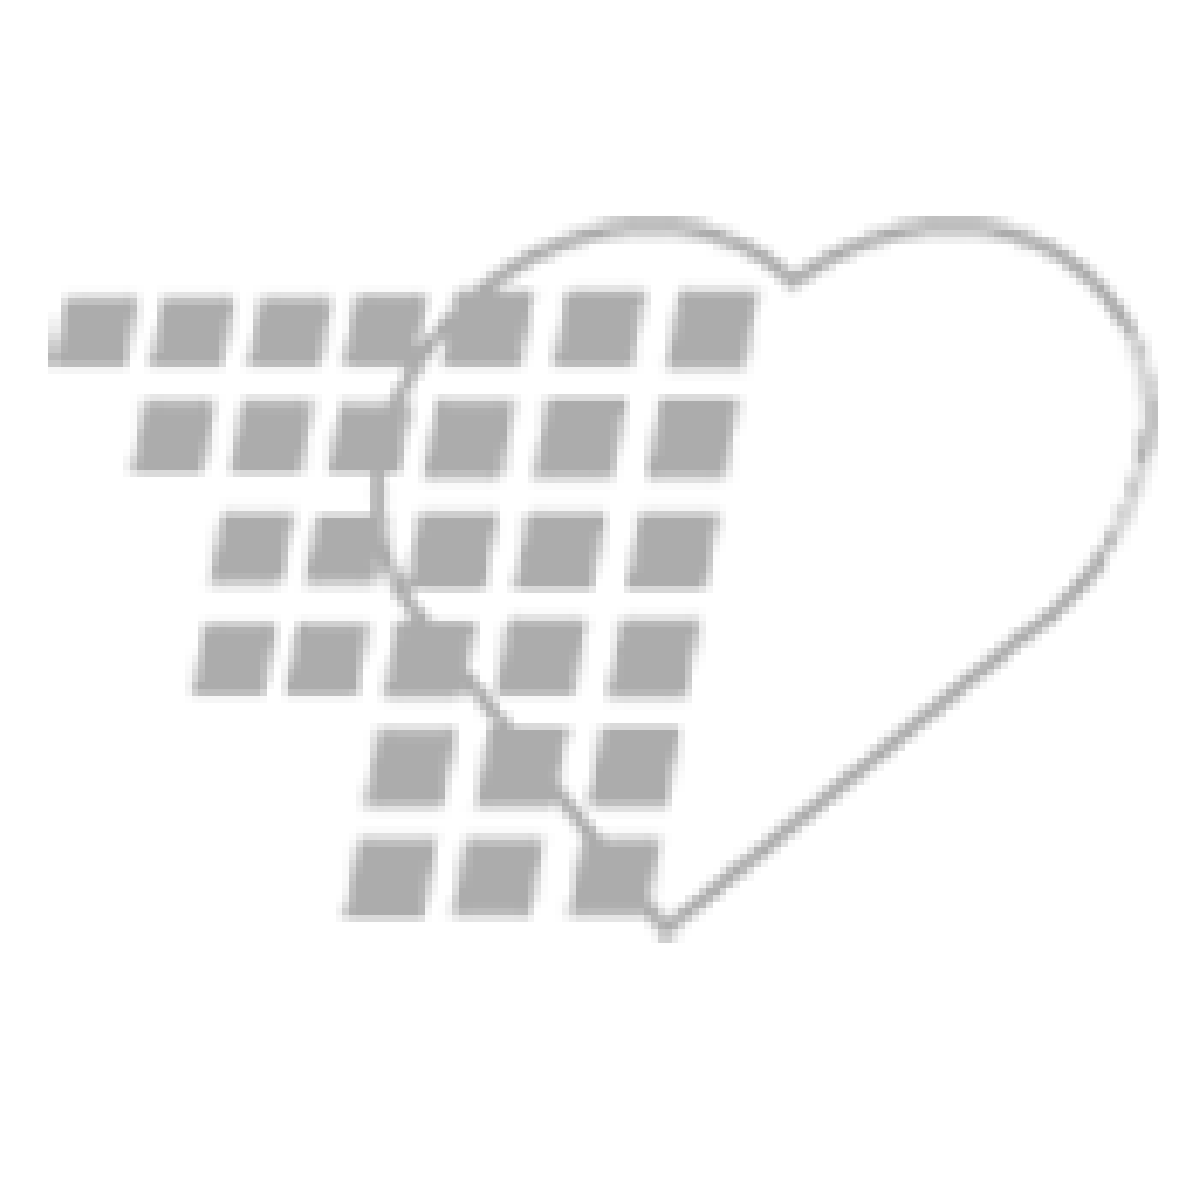 03-32-5524 - LYSOL® Brand I.C.   Foaming Disinfectant Cleaner - (ships ORMD)